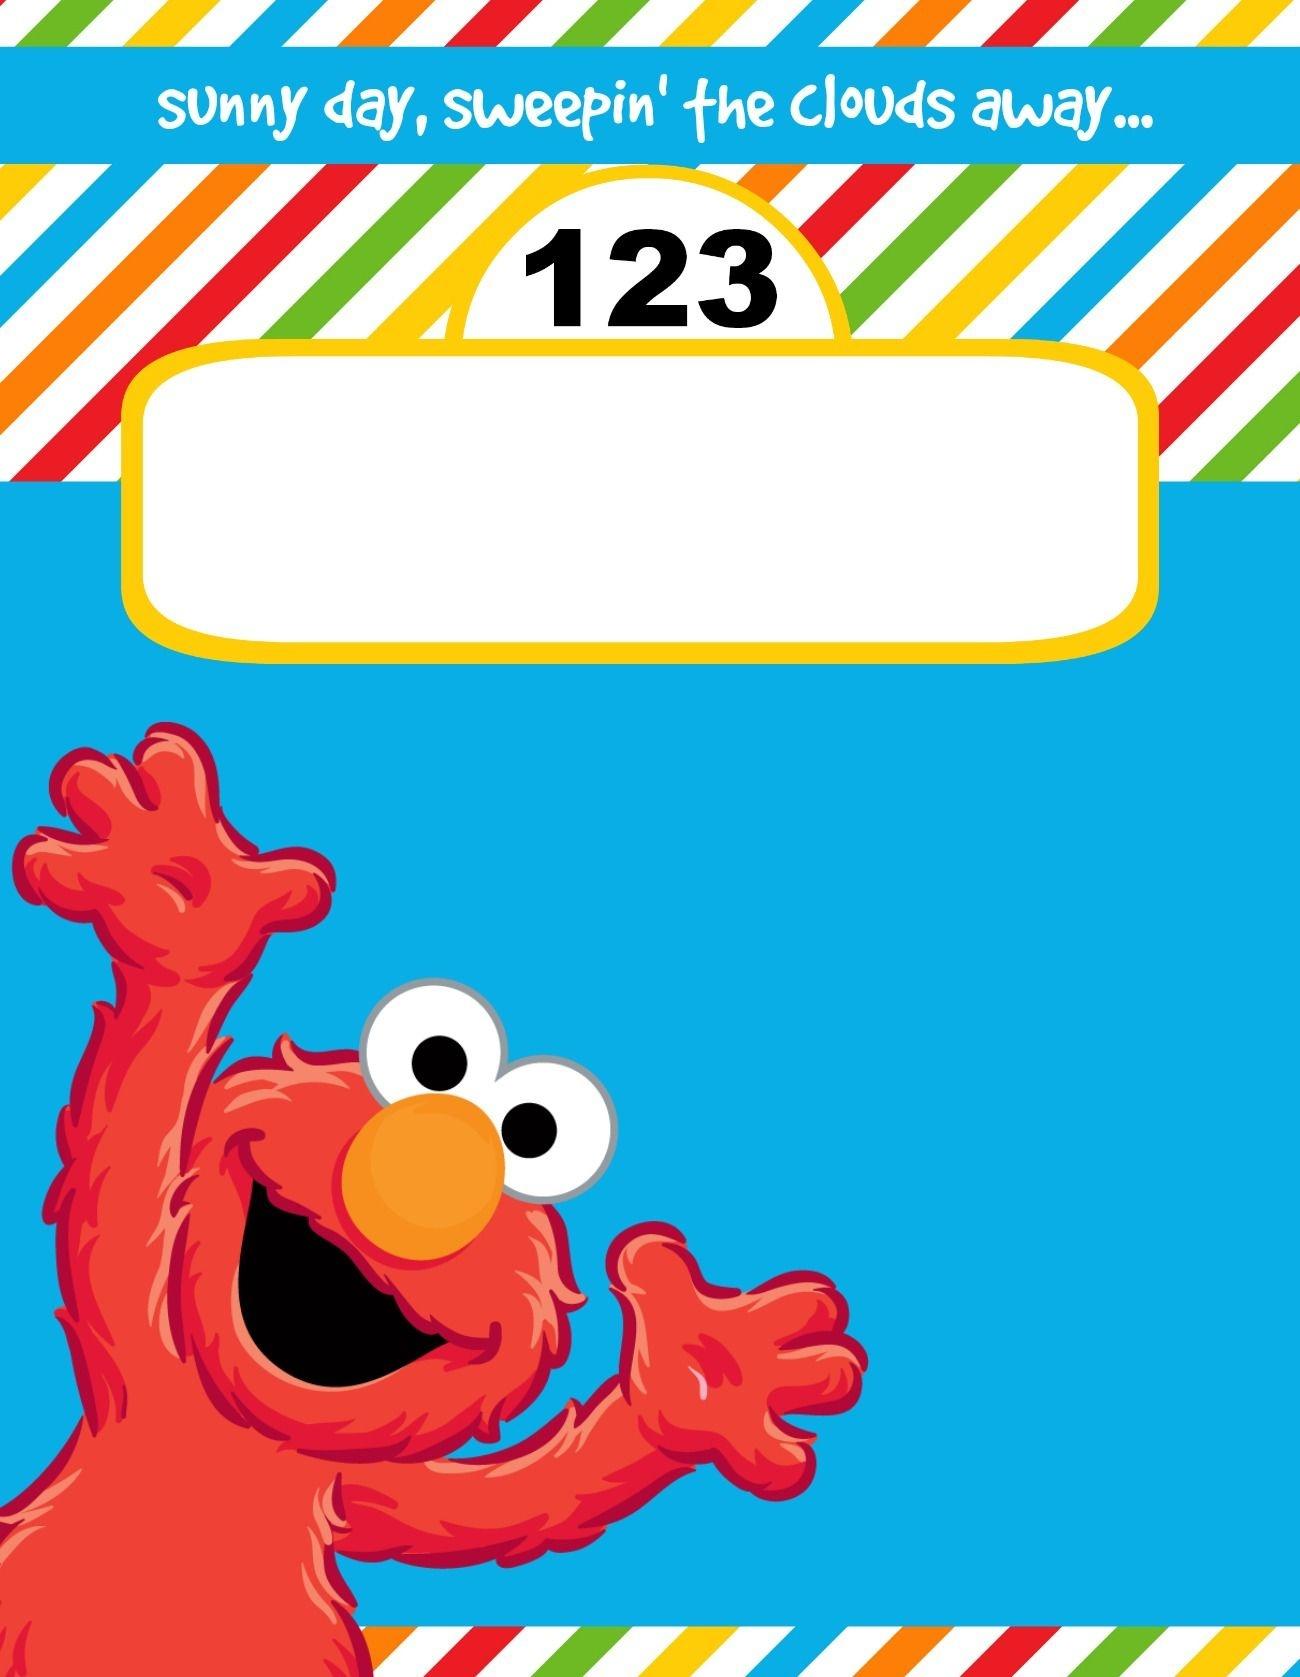 Pinnuk Mack On Jae 1St Party In 2019 | Elmo Birthday Invitations - Free Printable Cookie Monster Birthday Invitations